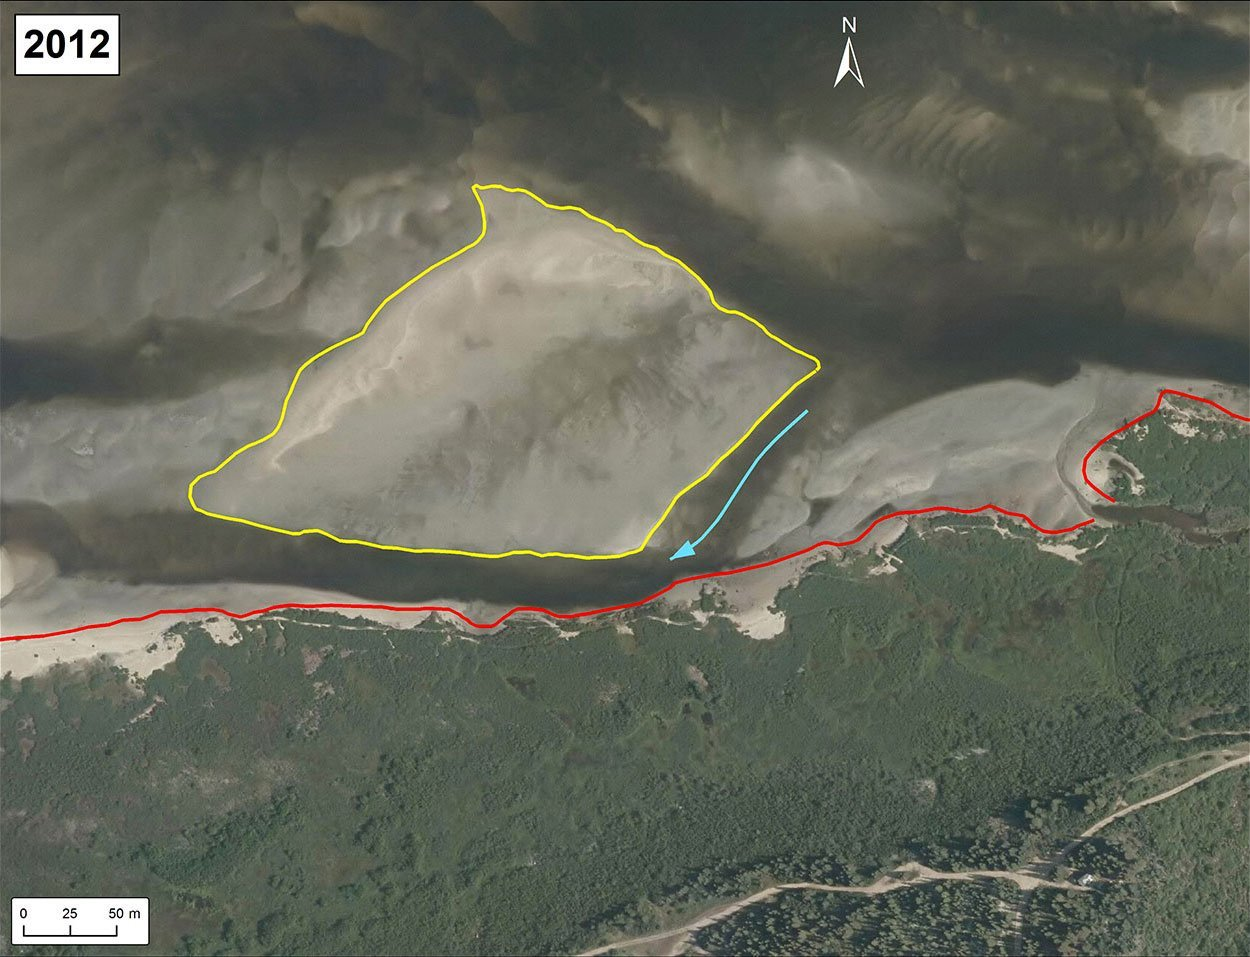 Erosion Chisasibi banc de sable 2012